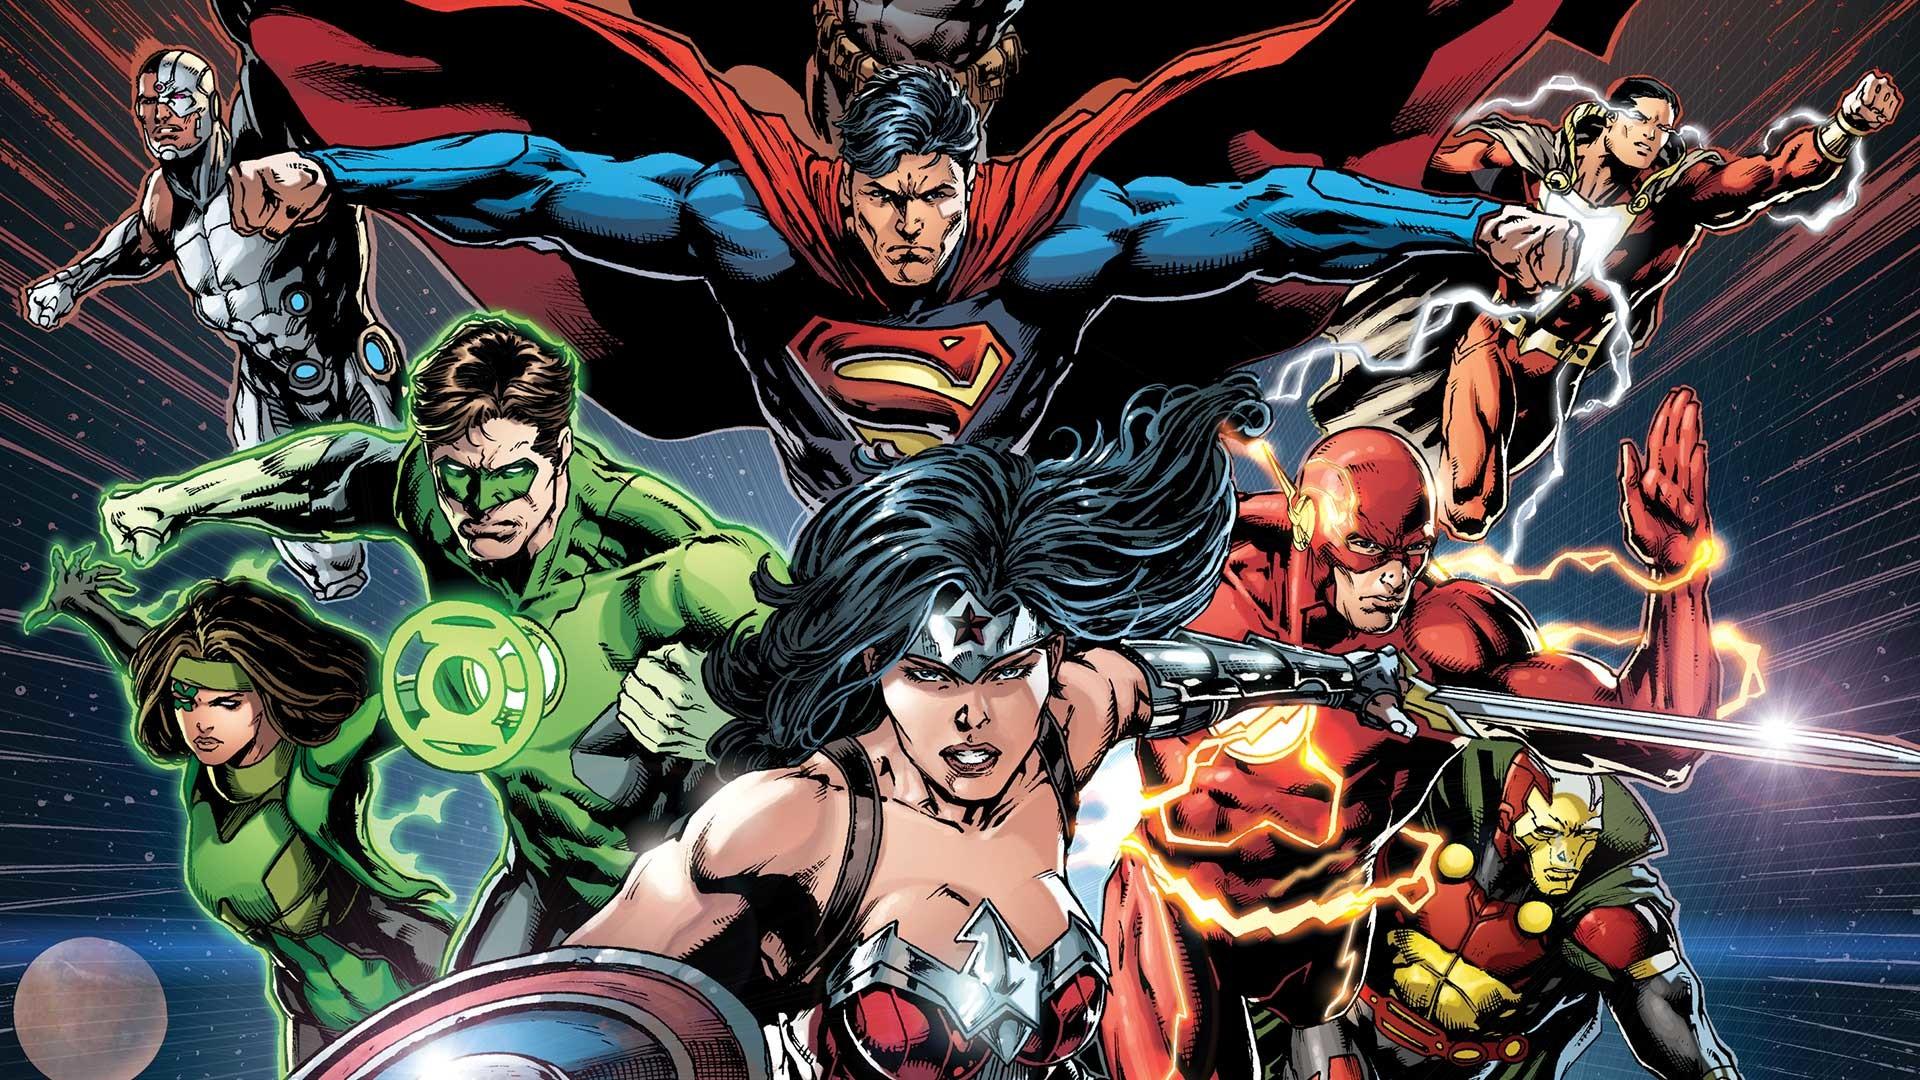 Comics – Justice League Wonder Woman Superman Green Lantern Cyborg (DC  Comics) Flash Wallpaper